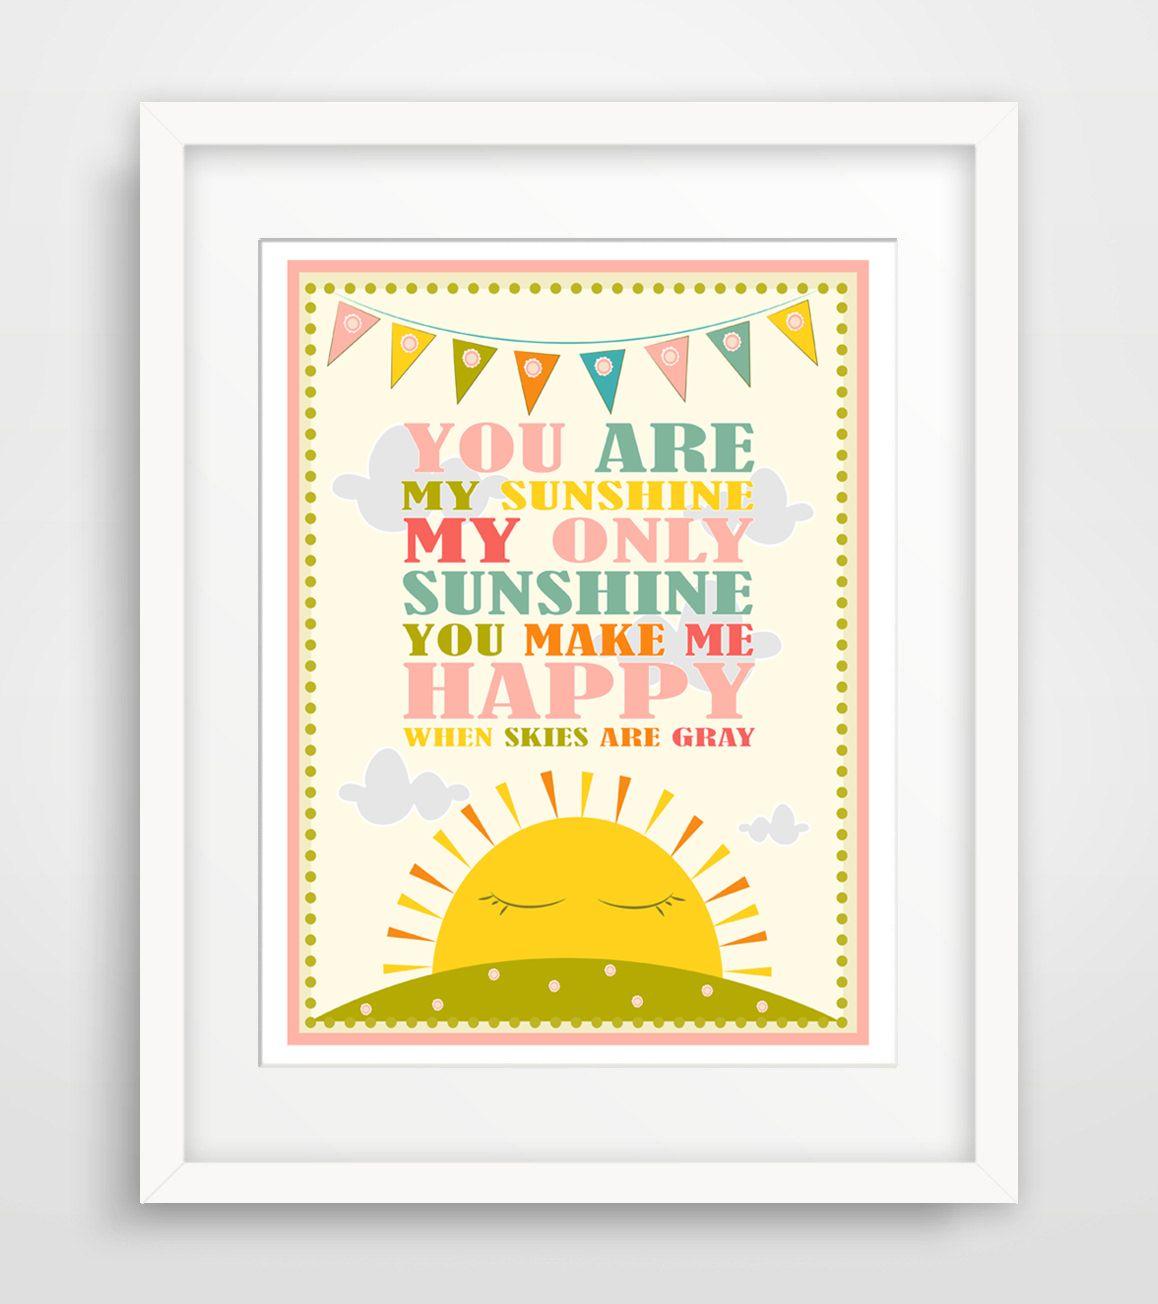 Supermarket: Childrenu0027s Wall Art / Nursery Decor / Kids Room You Are My  Sunshine.